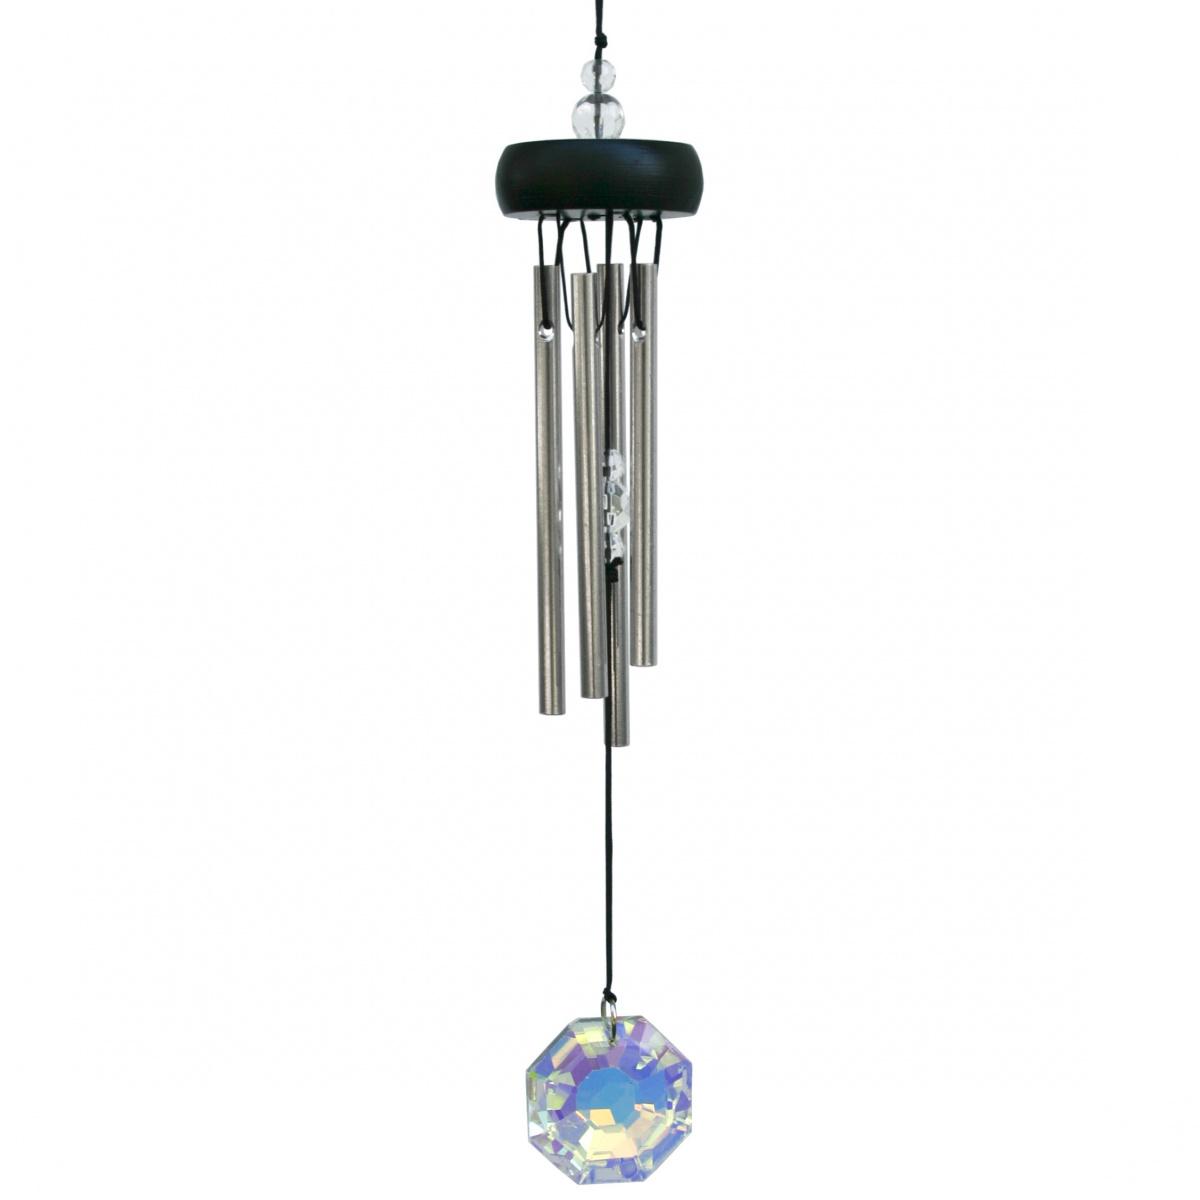 Woodstock vindspil, 30 cm - Ædelsten, krystal